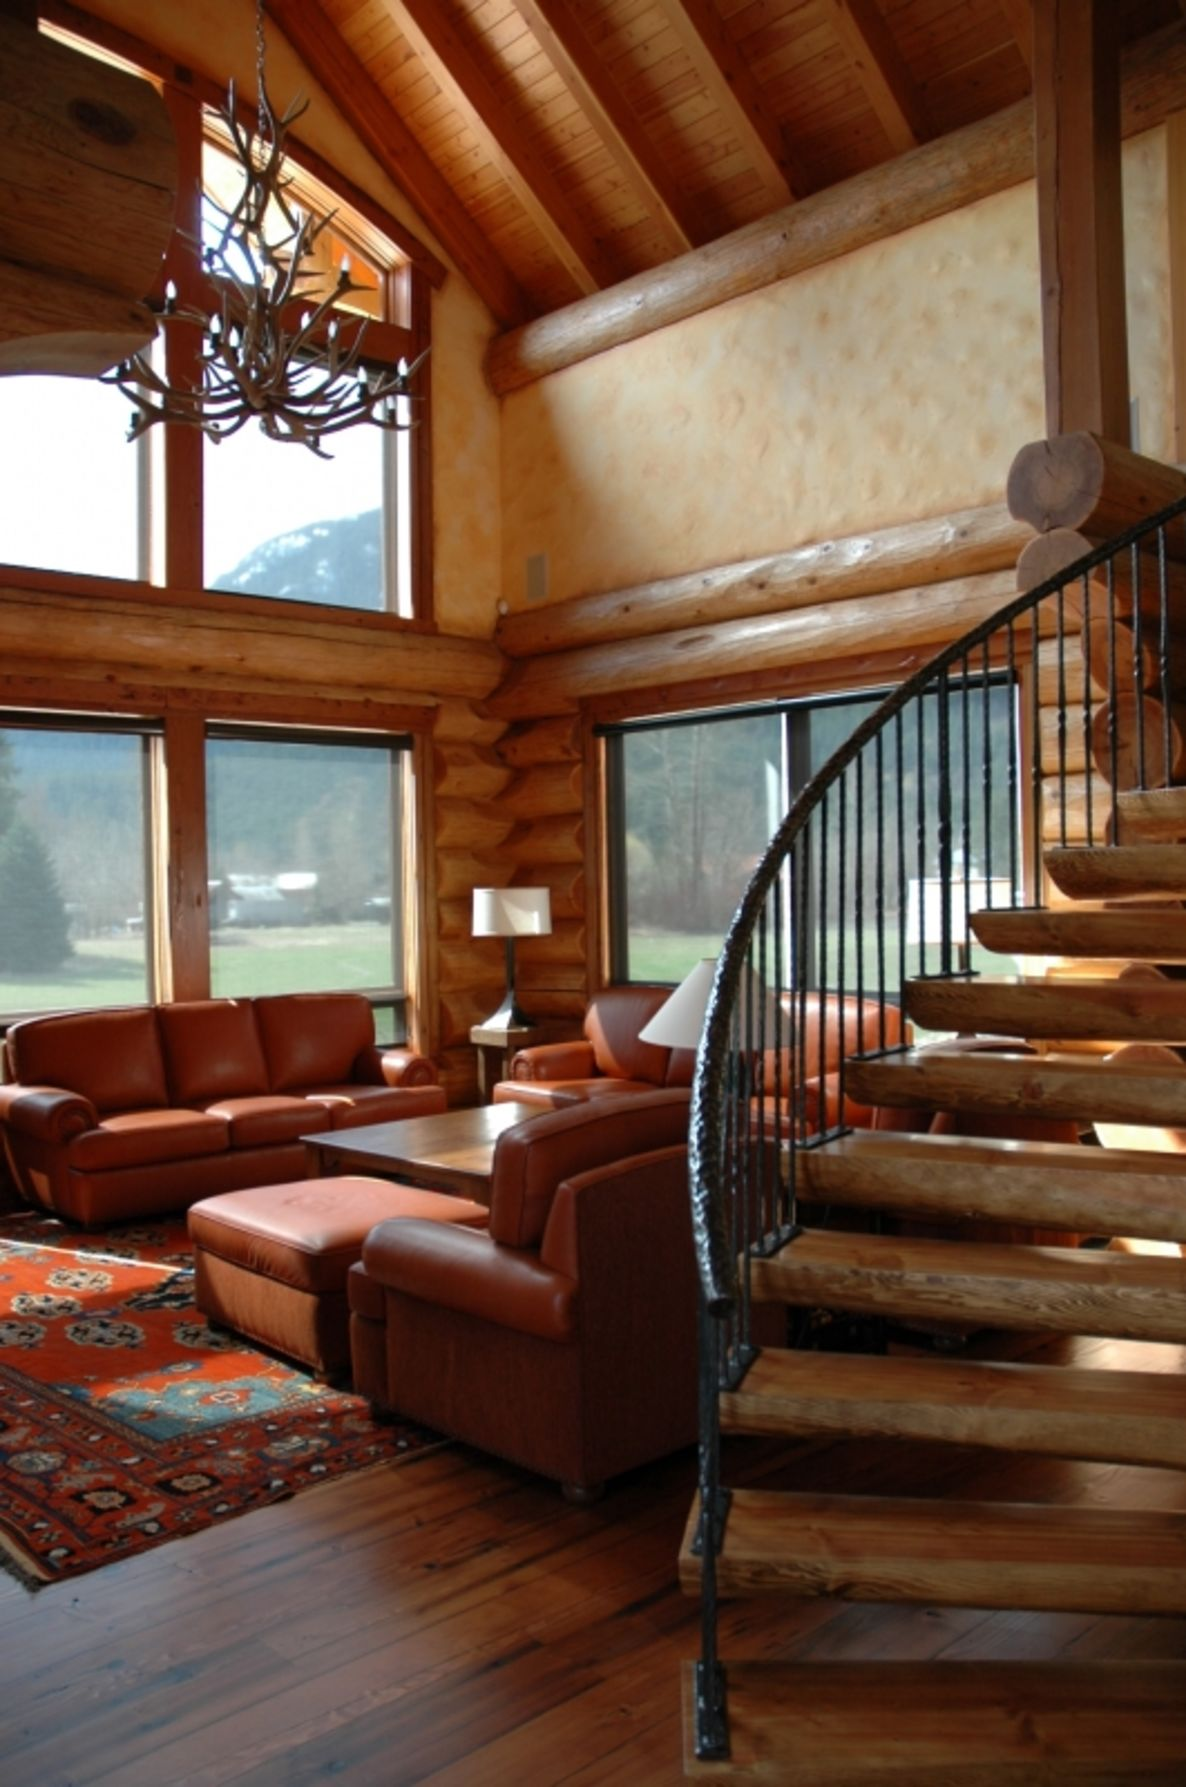 Log Stairs and Hand-Railing